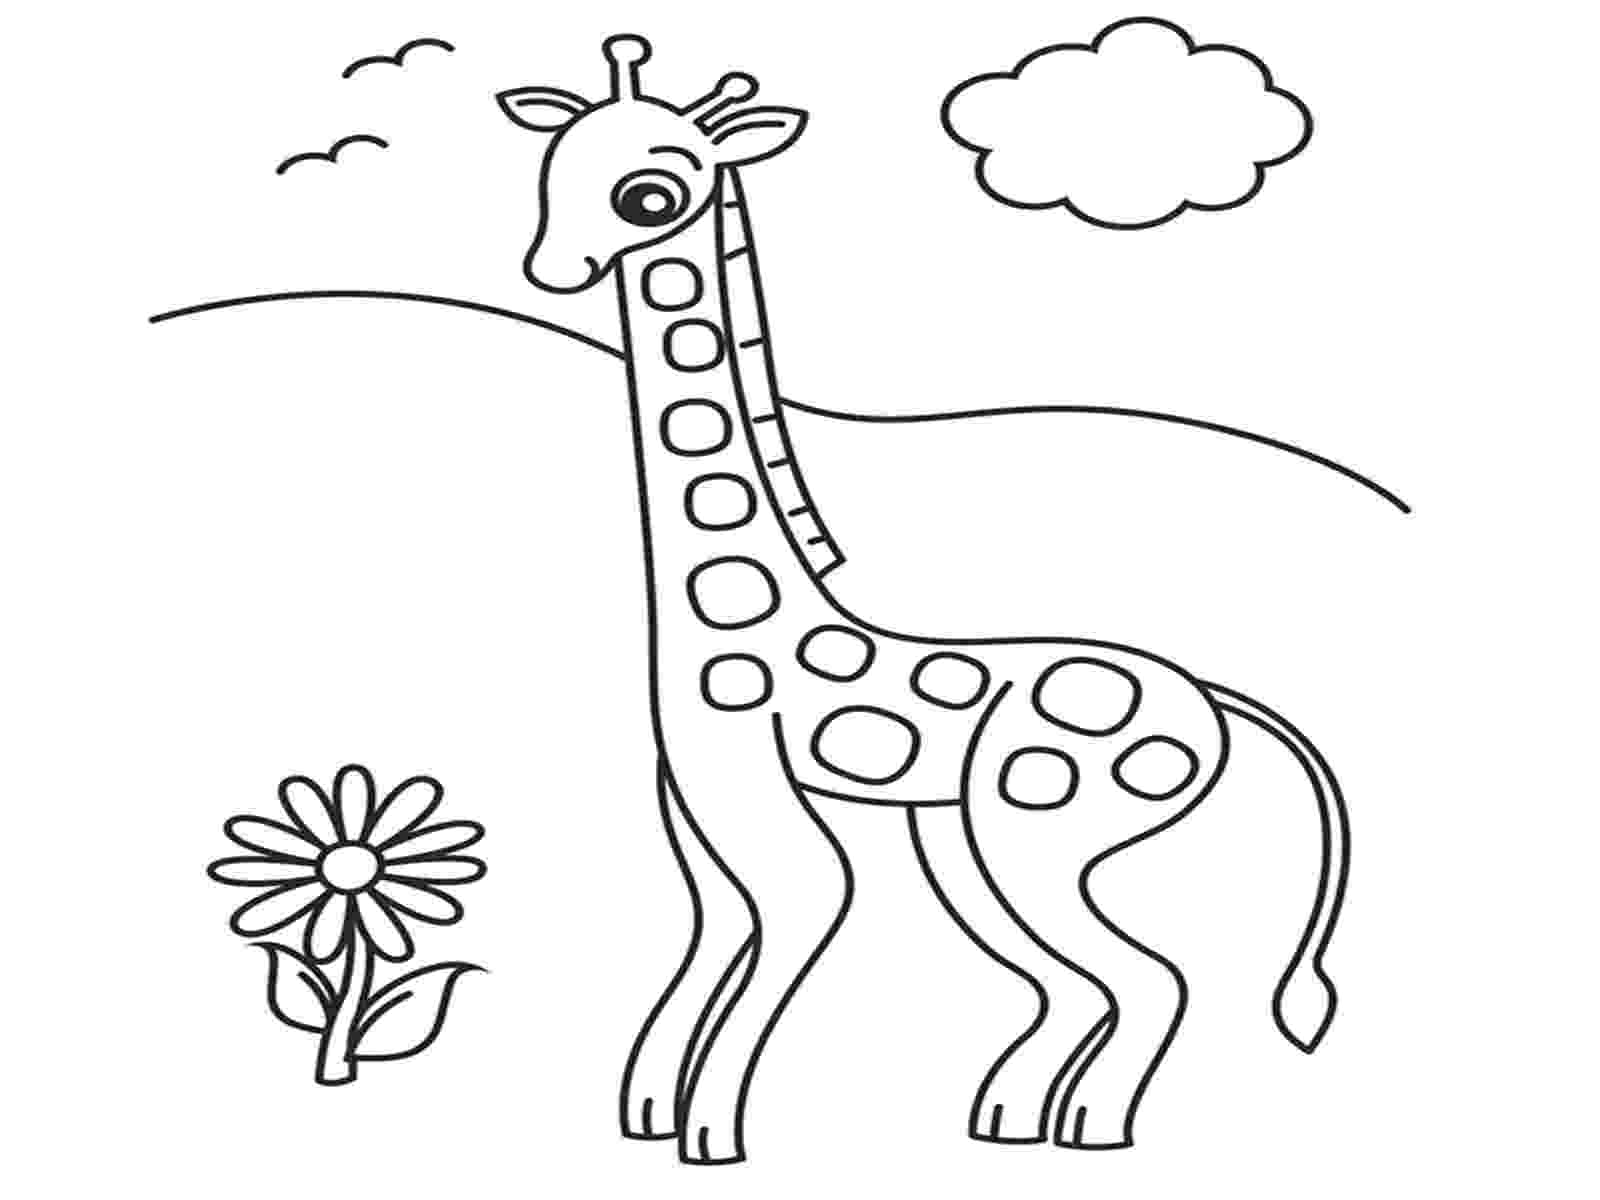 coloring page giraffe free printable giraffe coloring pages for kids coloring giraffe page